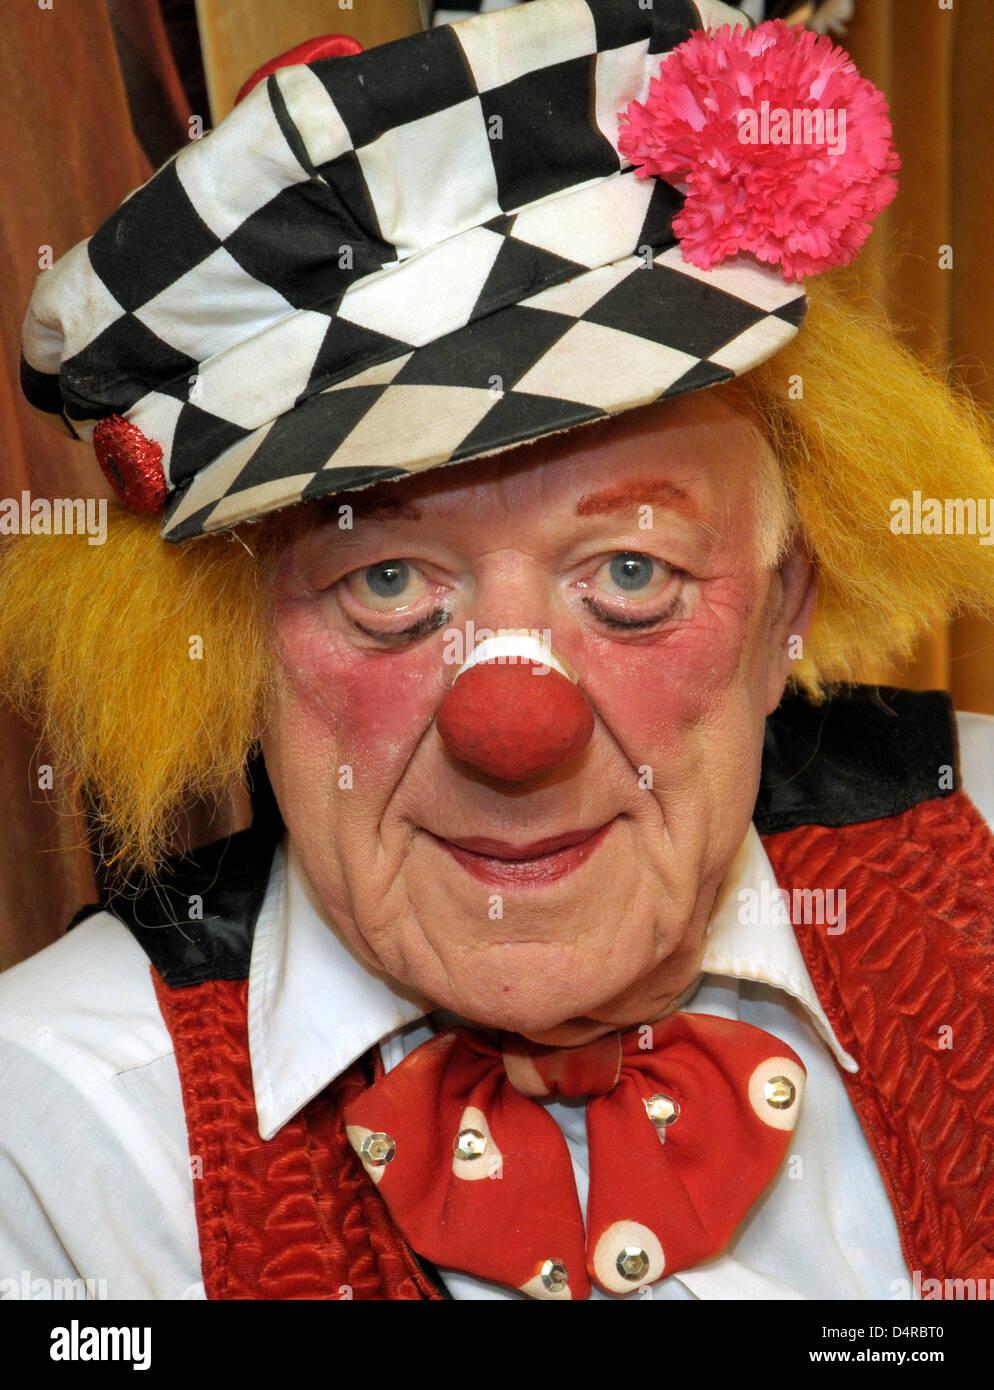 Clown Popov